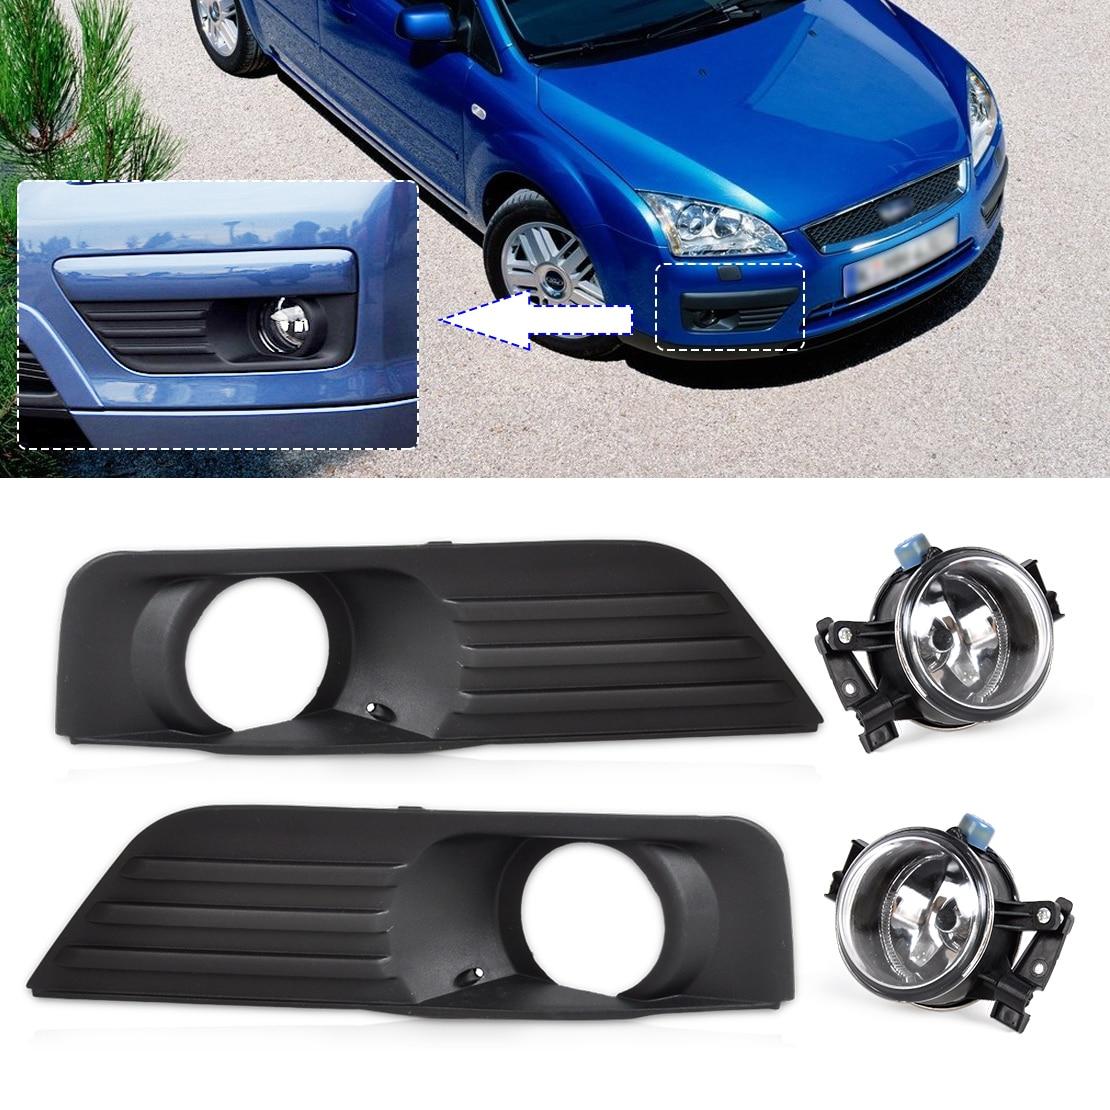 Dwcx front lower left right bumper fog light grille cover lamp kit set 4m51